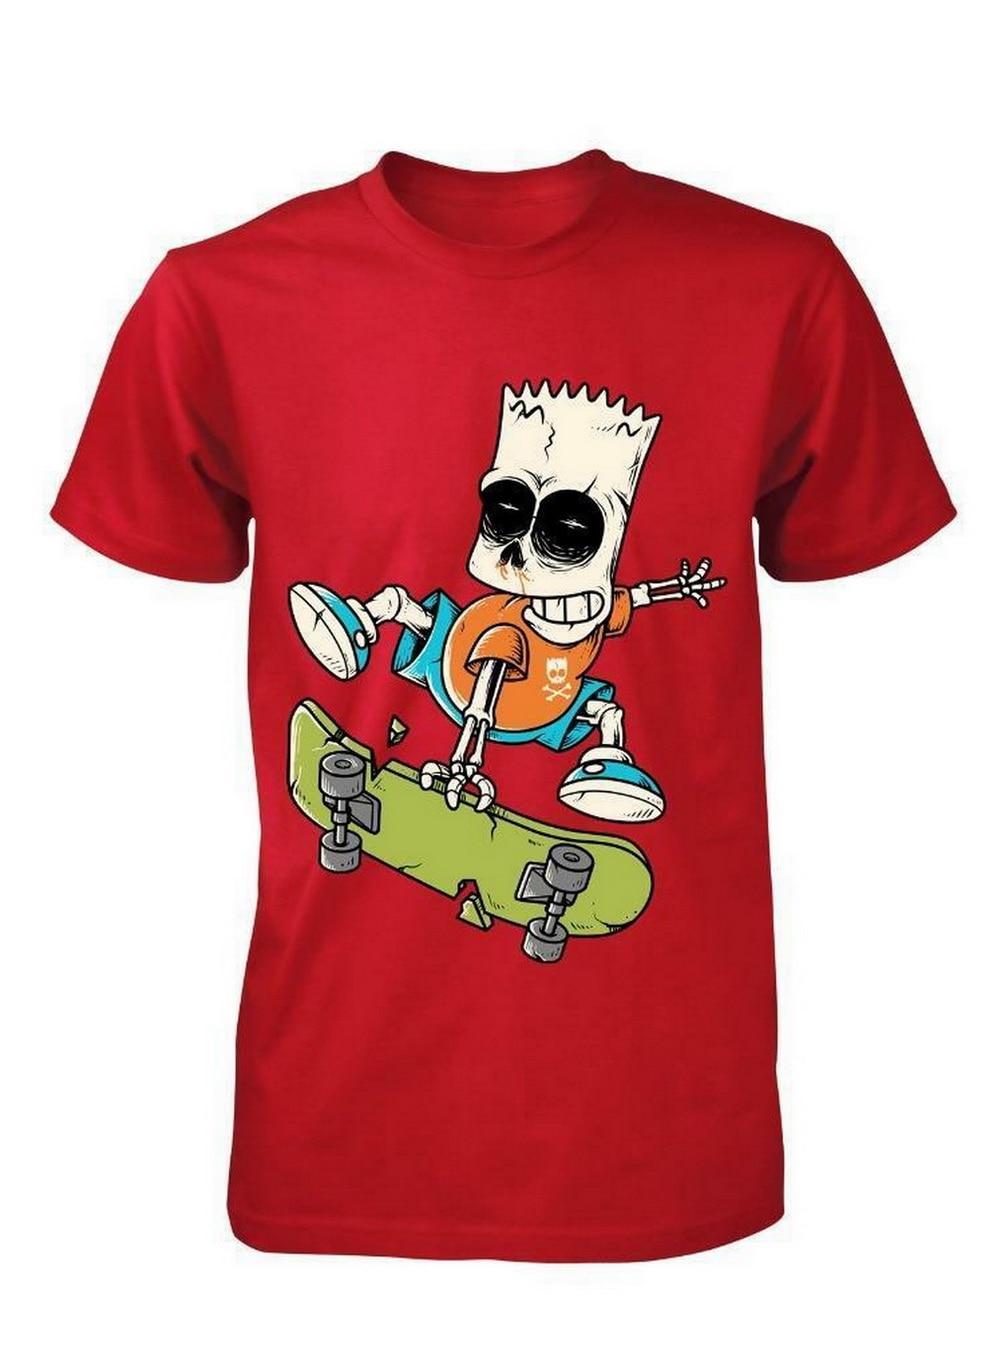 Camiseta divertida de patineta amante ZOMBIE BART SKATER de dibujos animados de HOMER camiseta para adultos S-XX Streetwear Tops camiseta